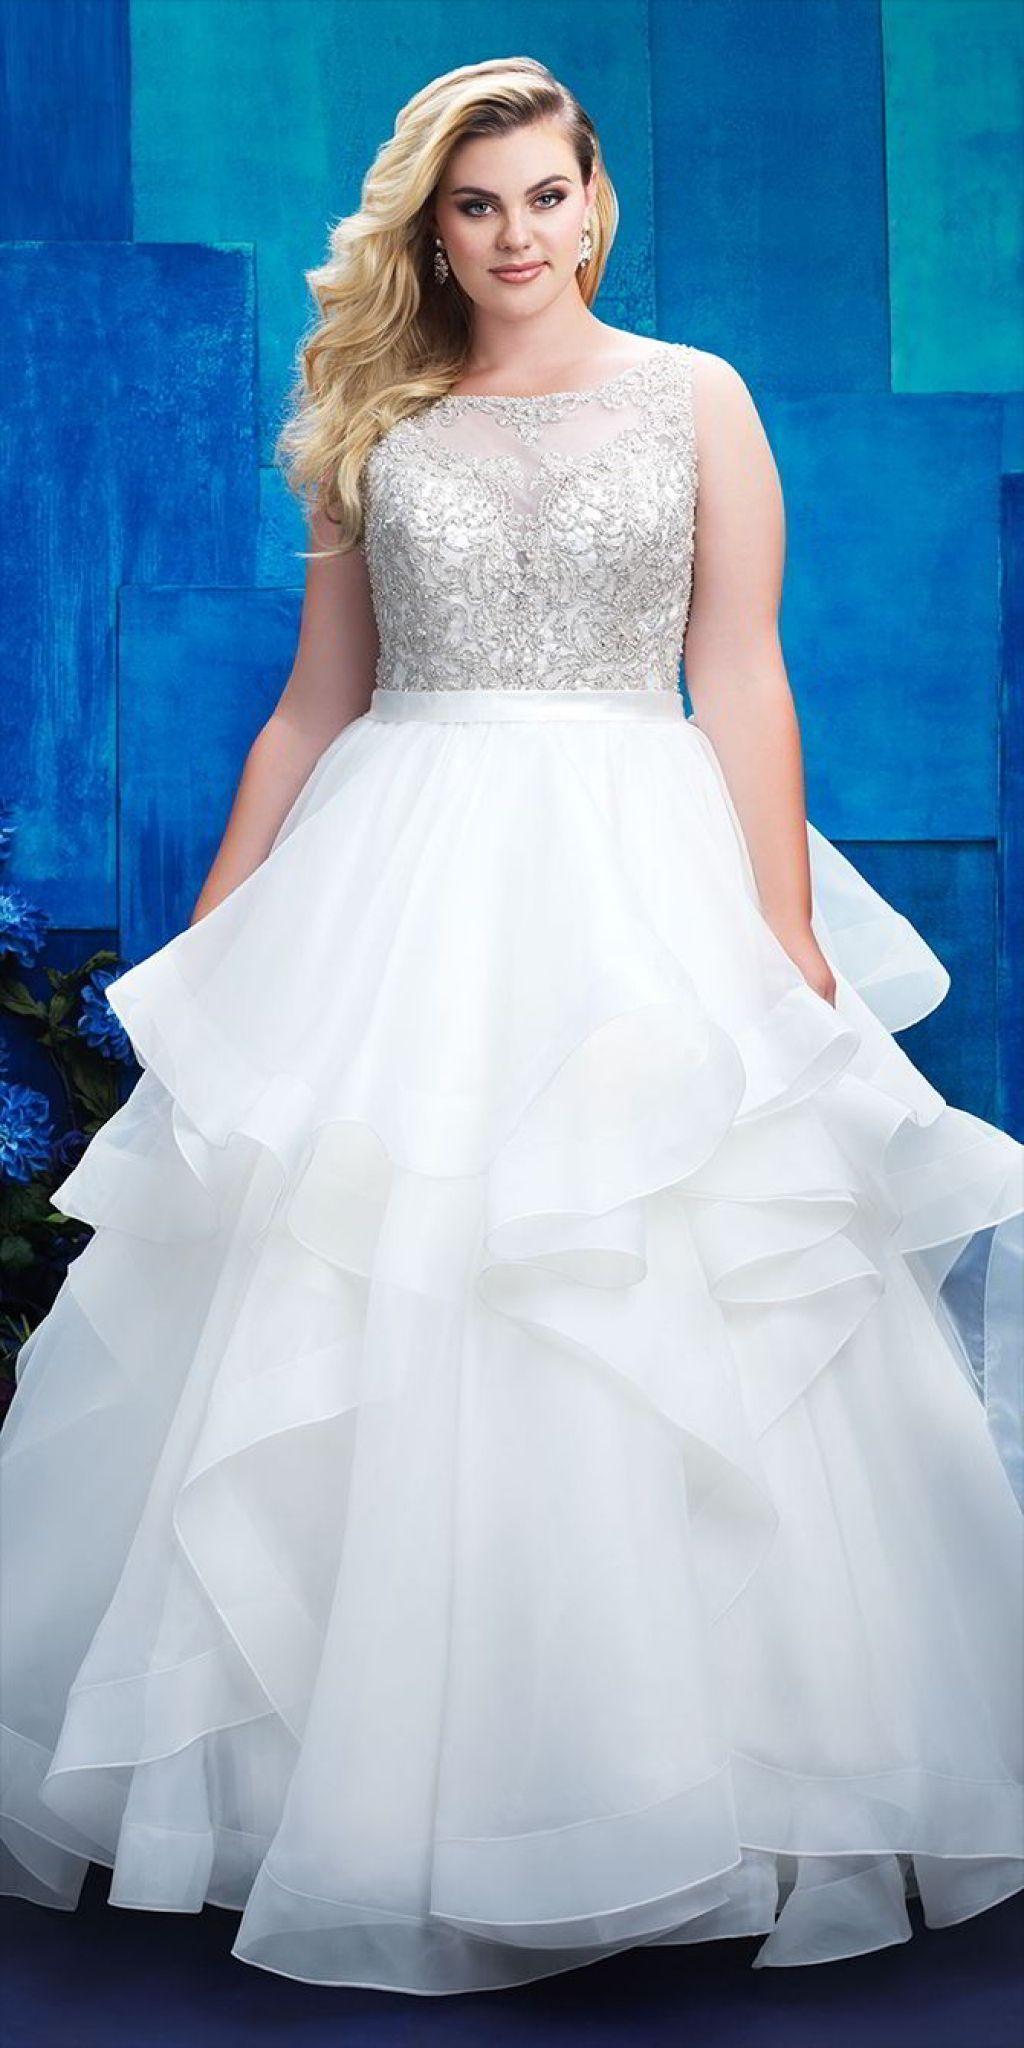 davids bridal maternity wedding dress - dressy dresses for weddings ...